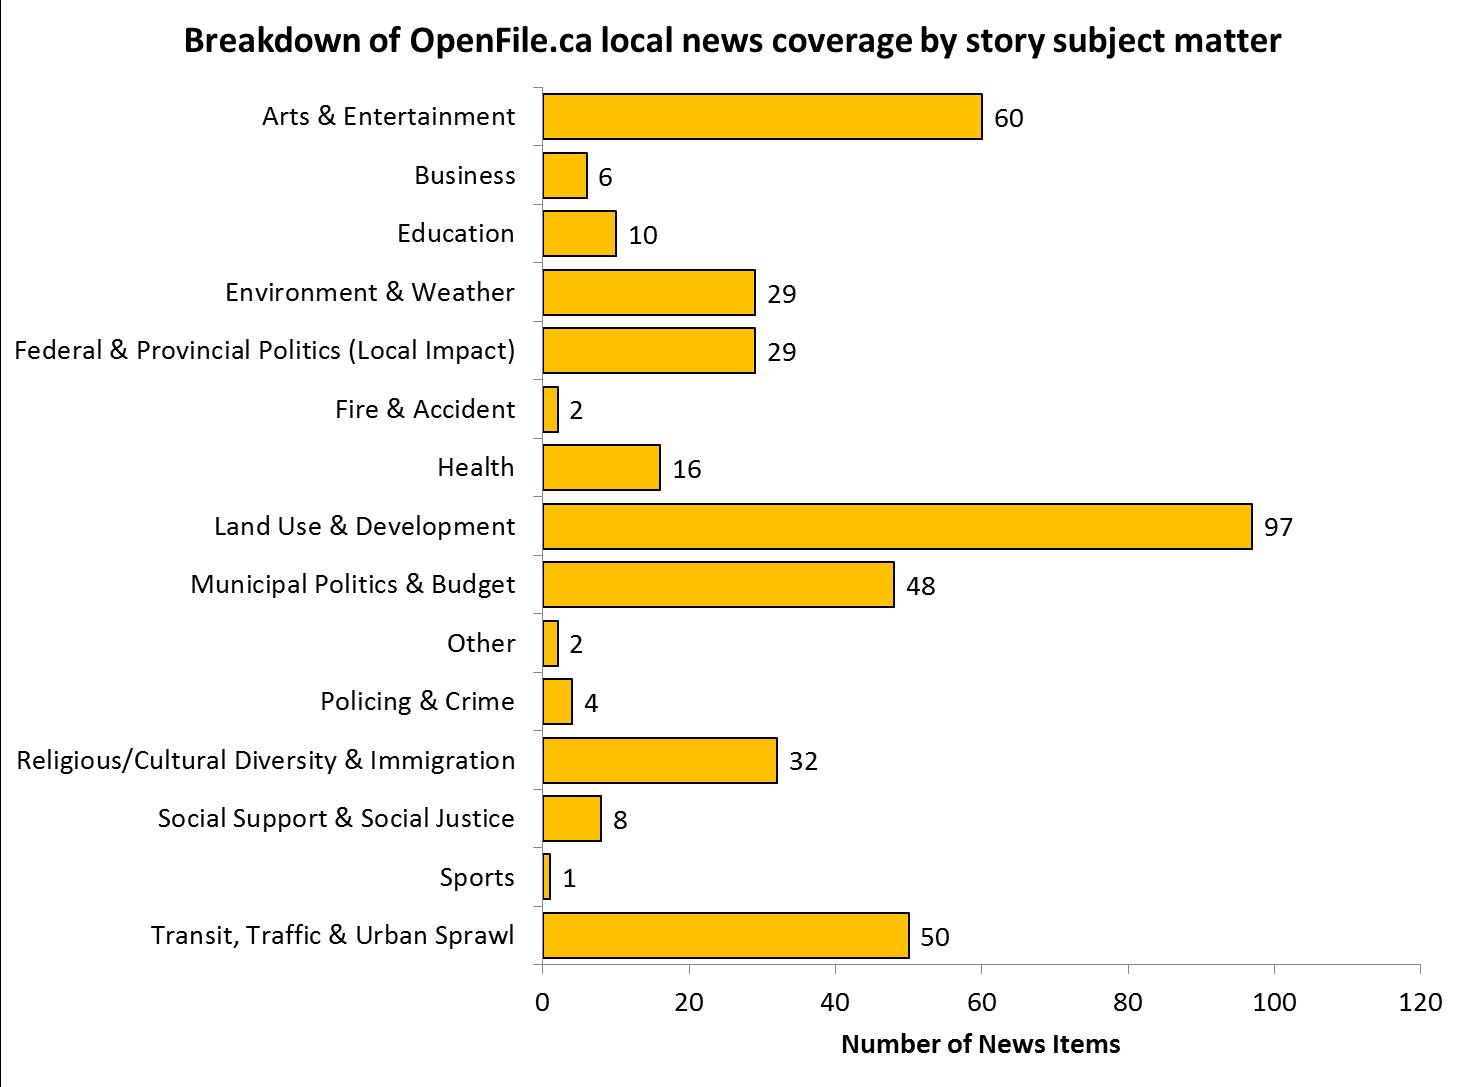 Chart breakdown of subject categories